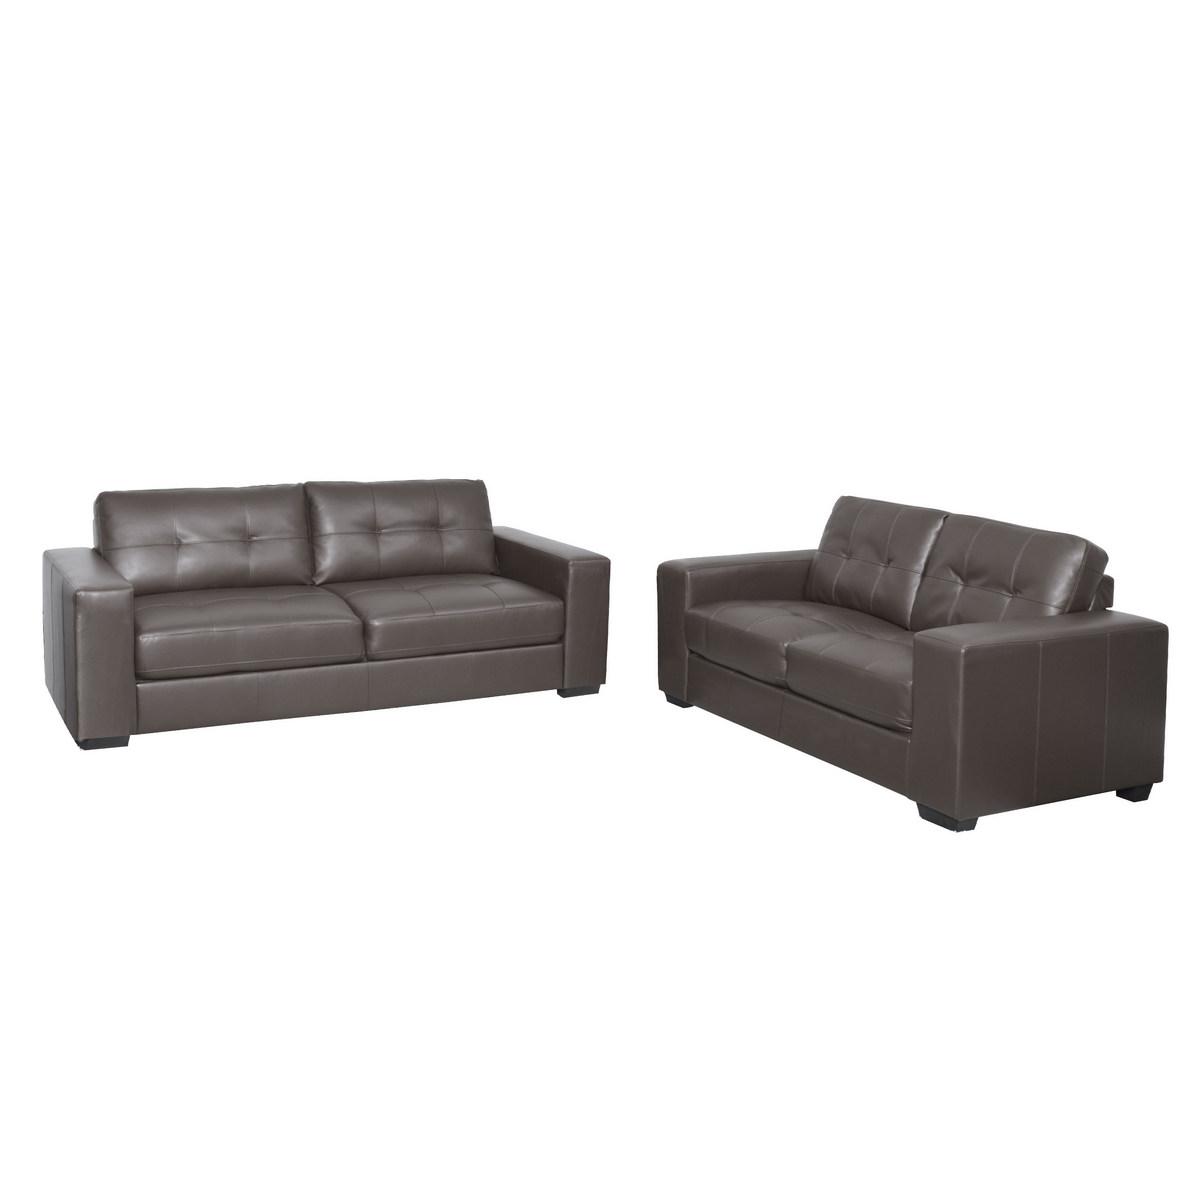 Corliving Club Tufted Brownish Grey Bonded Leather Sofa Set